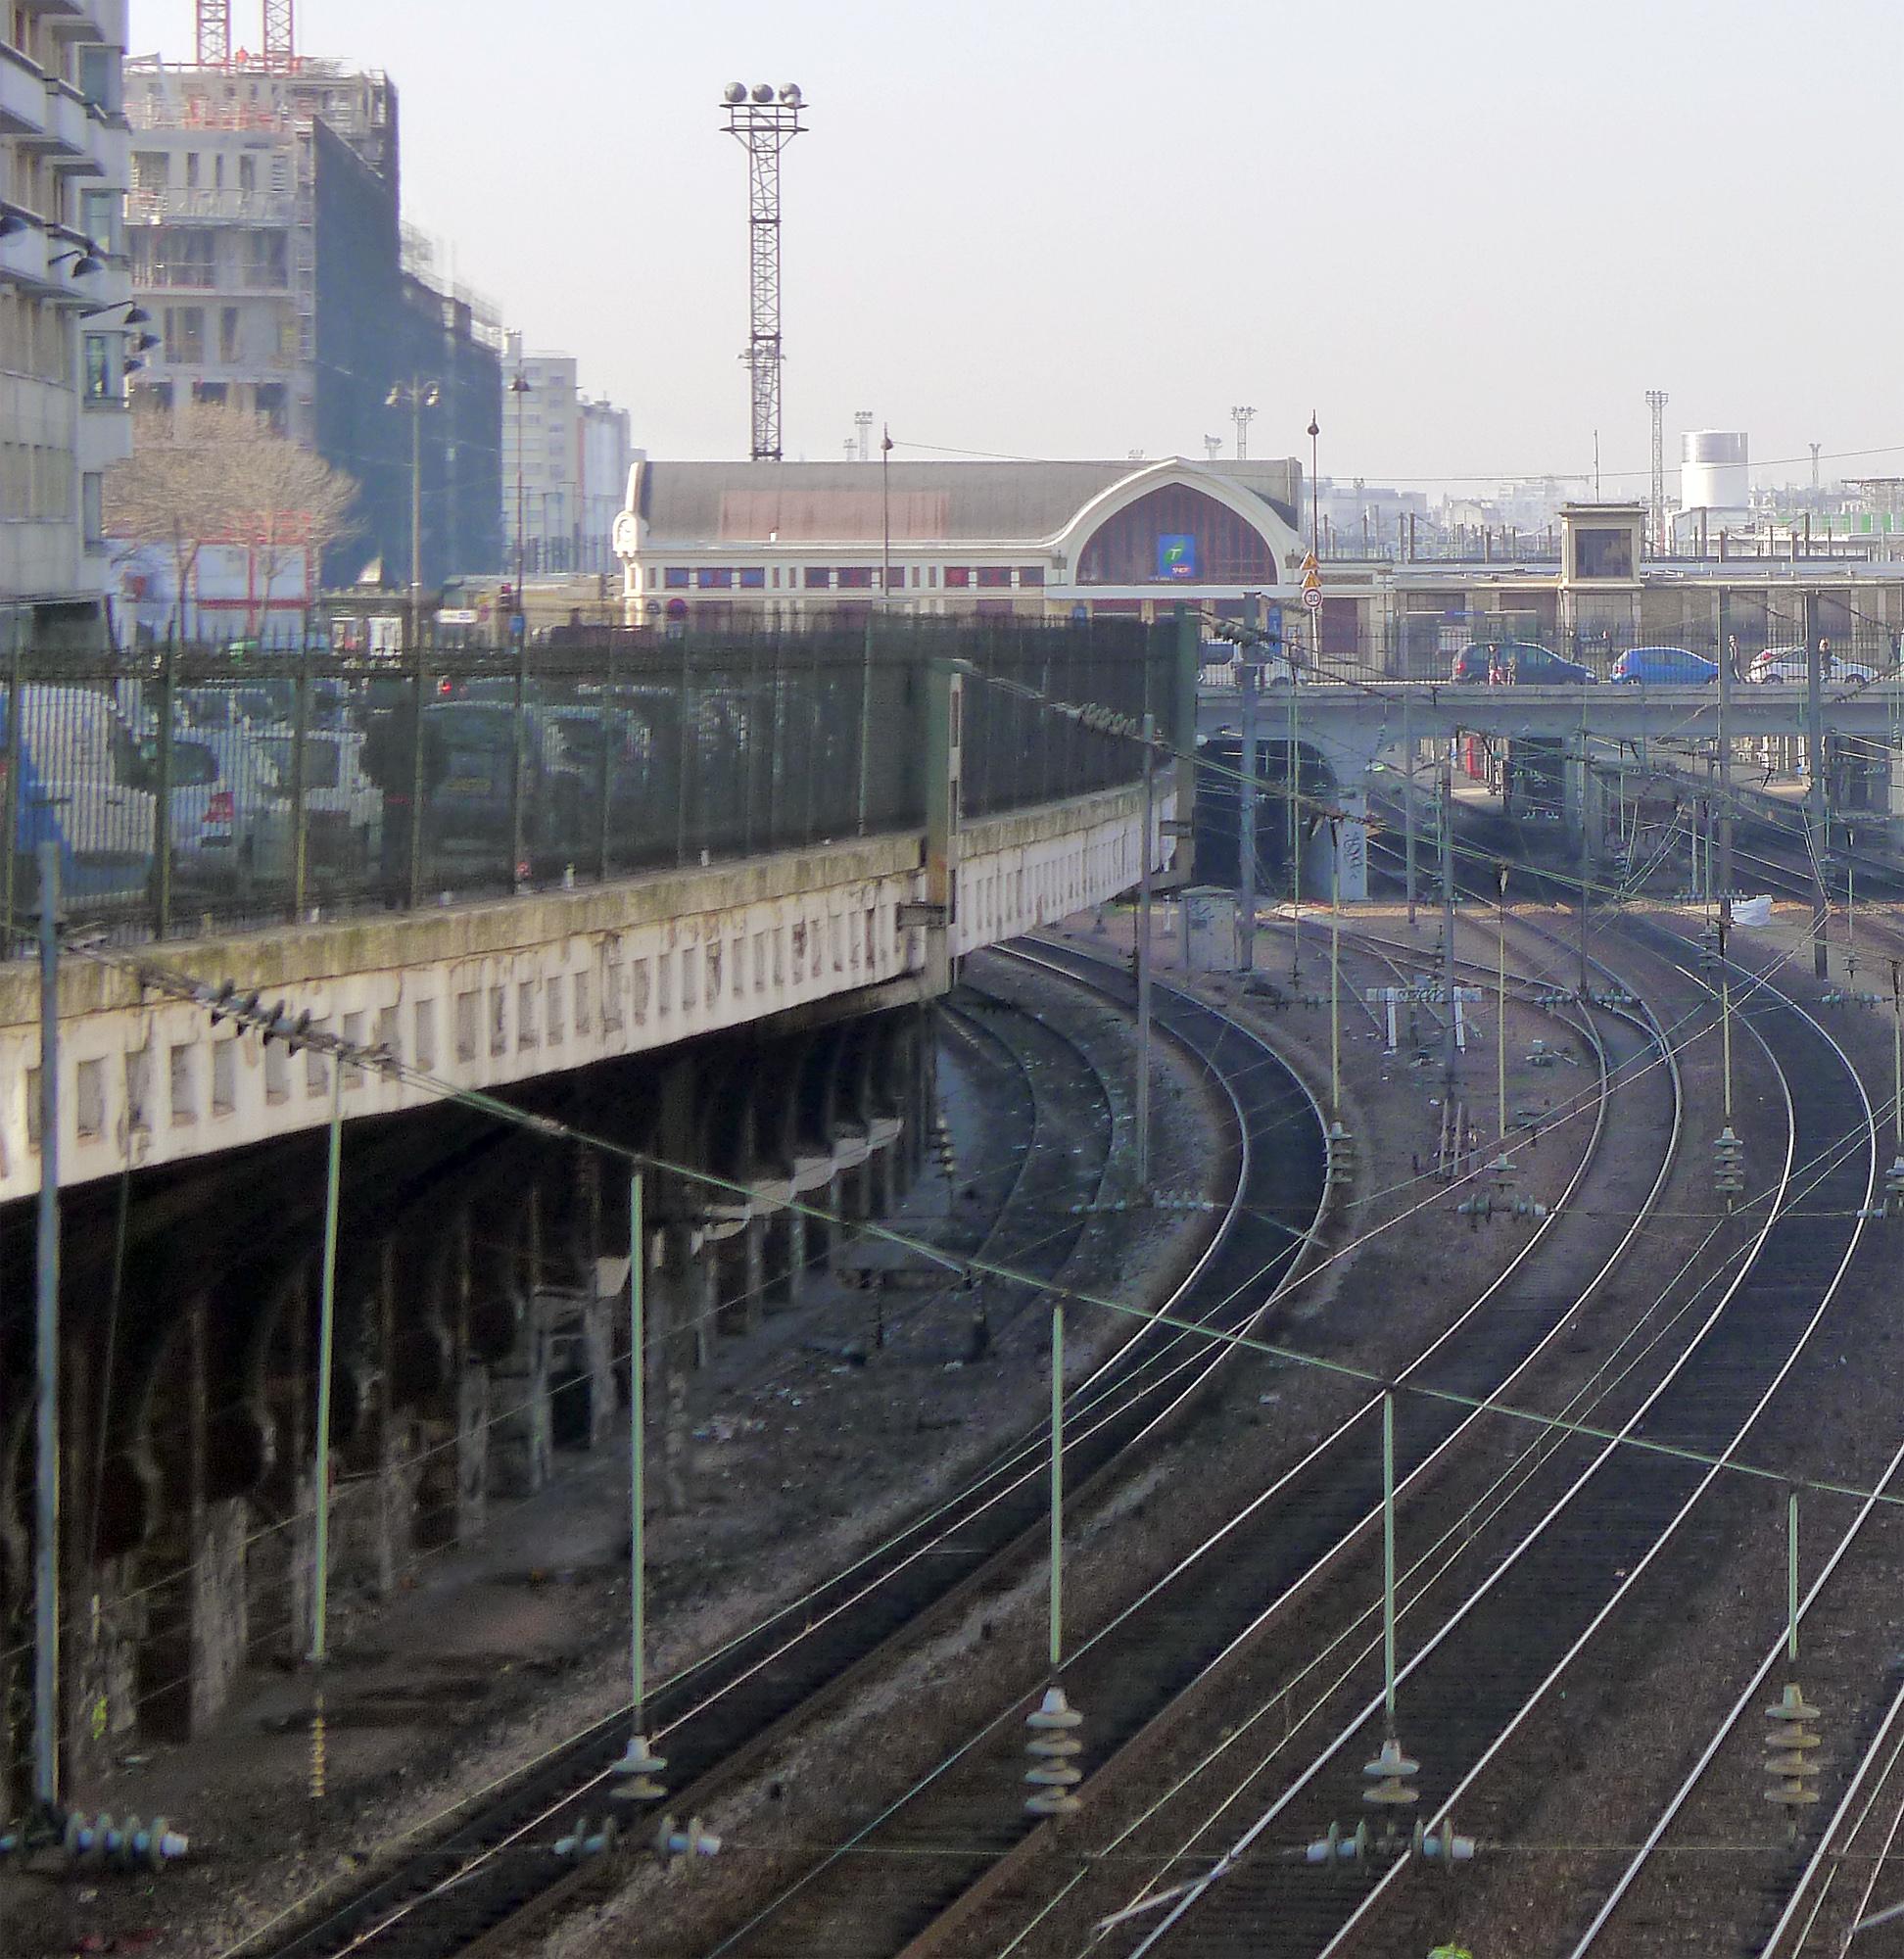 File:P1160925 Paris XVII rue de Rome gare de Pont-Cardinet rwk.jpg ...